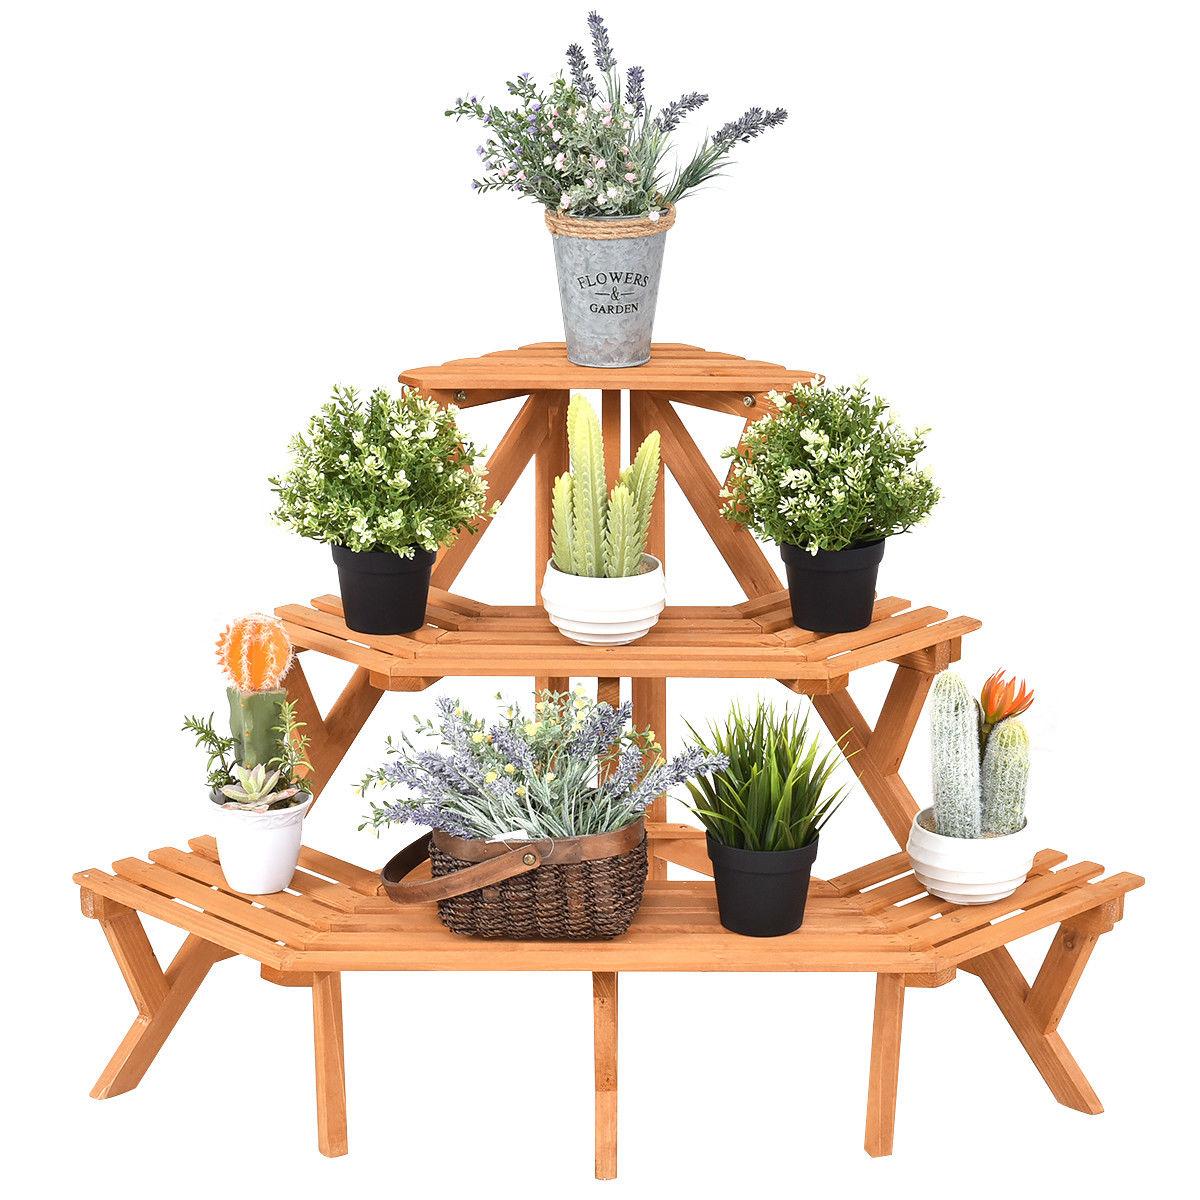 Costway 3 tier wood corner flower stand plant ladder pot holder display rack shelf